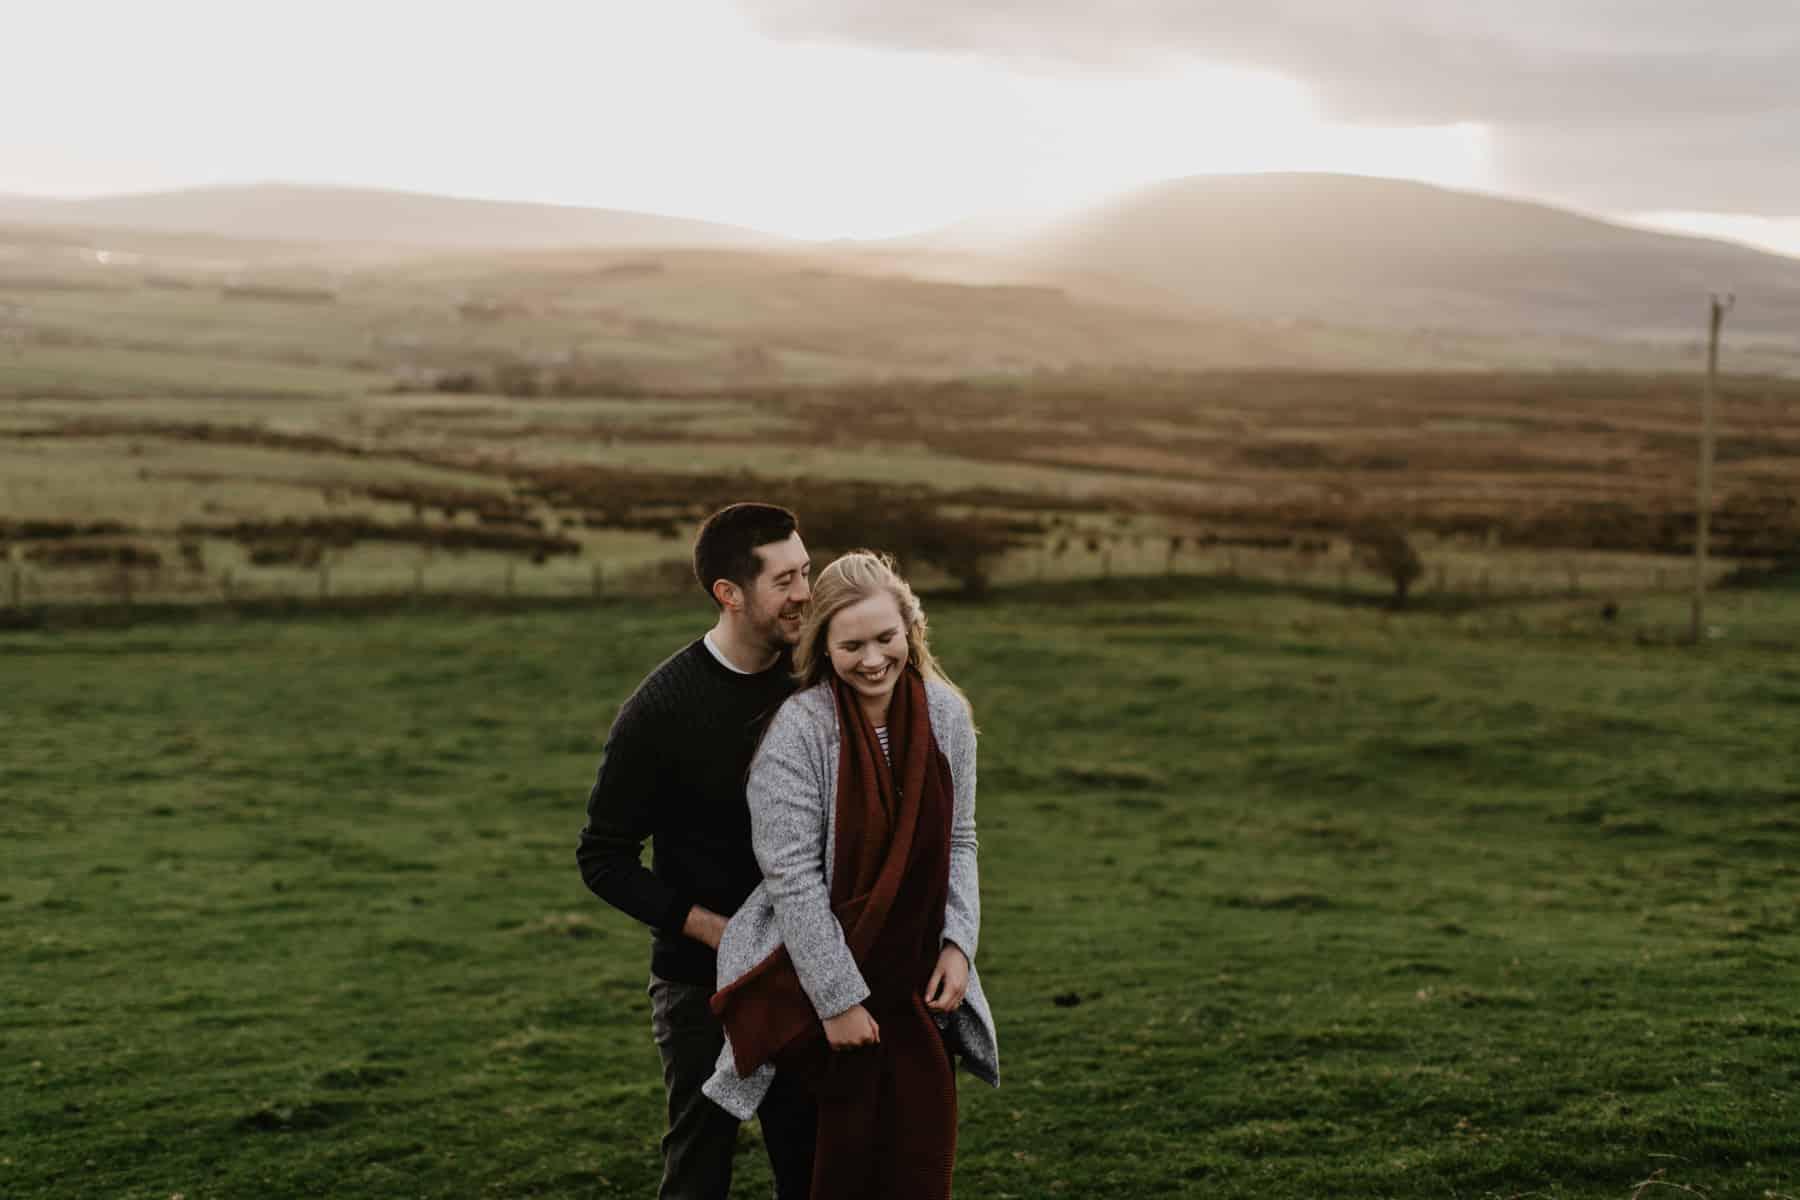 Dotty and Seamus - Ballycastle, Ireland